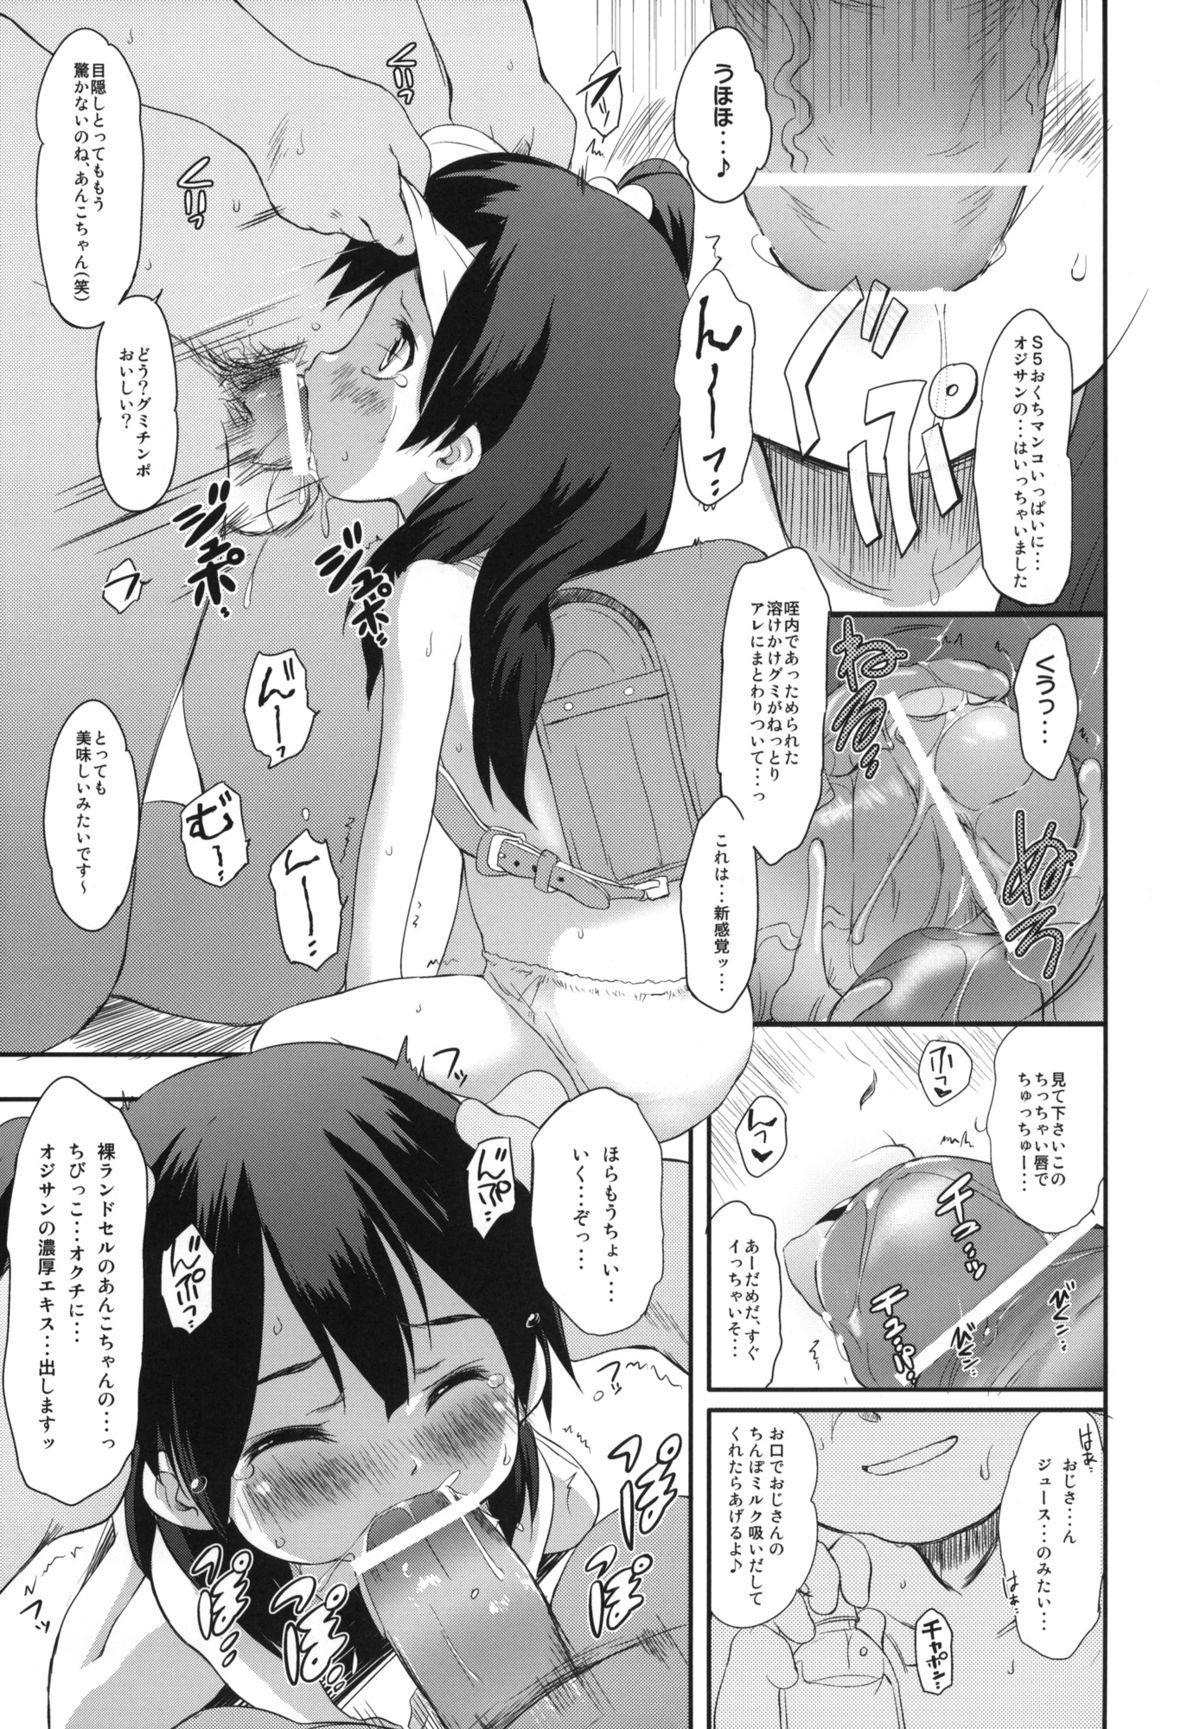 Usagiyama no Pet na Kanojo 5